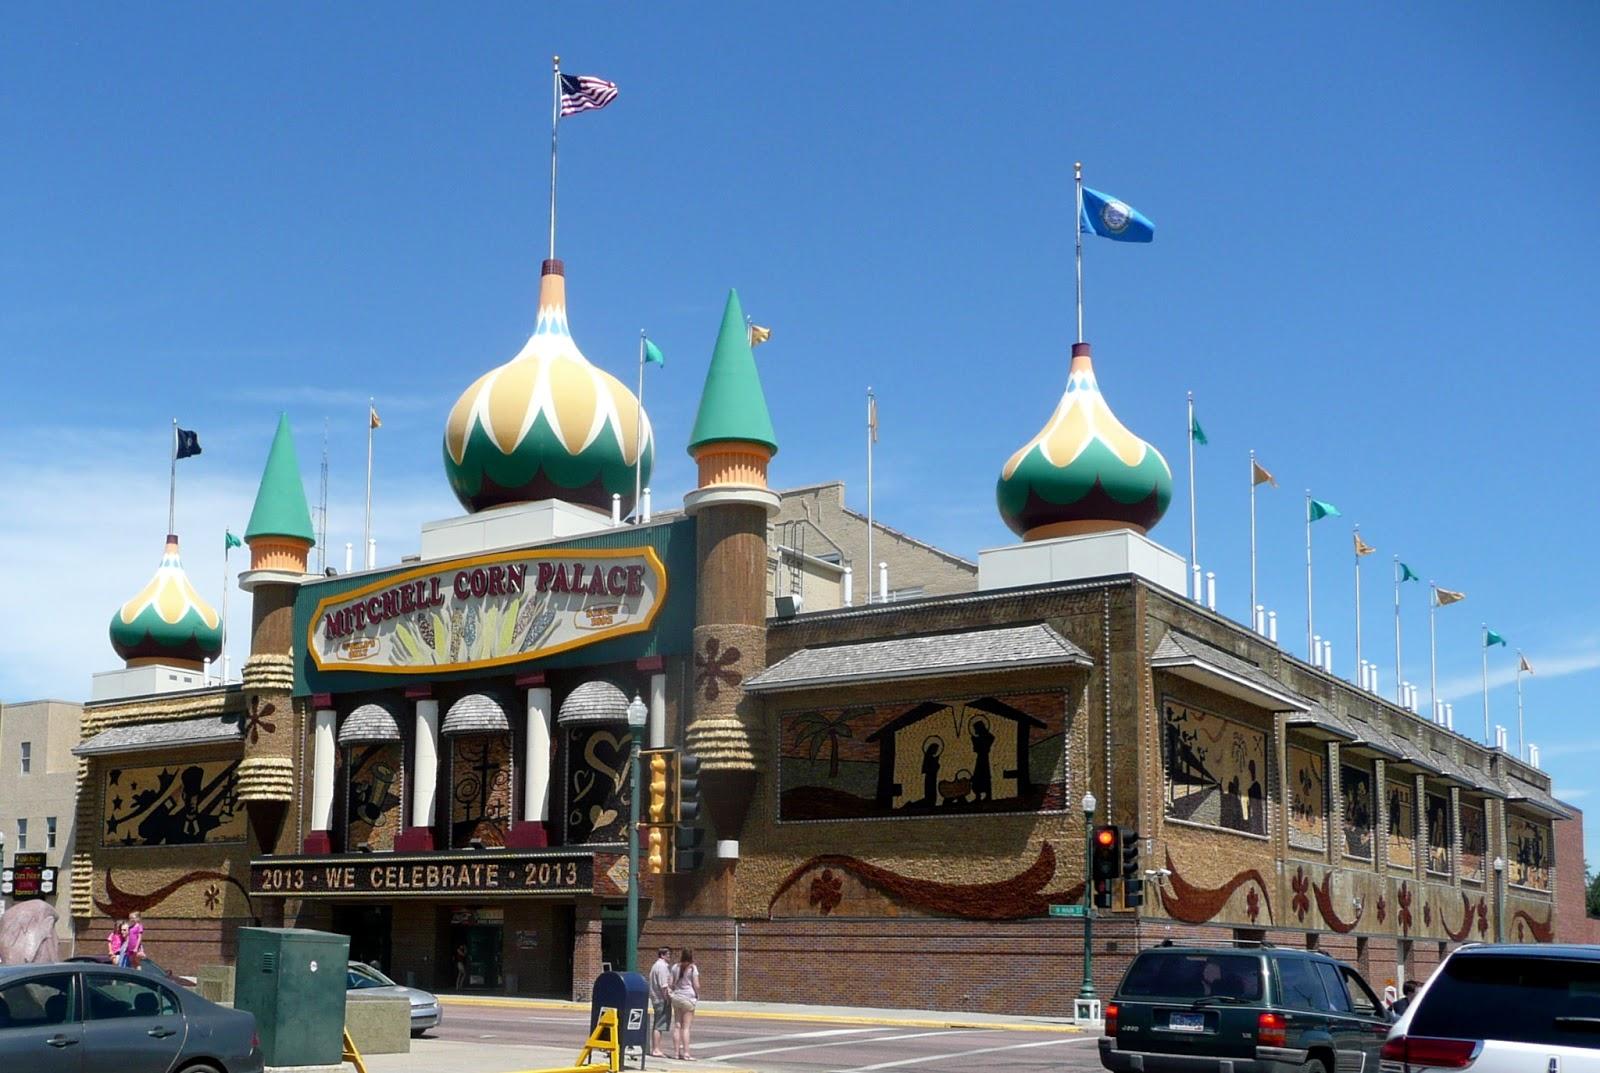 Dakota magic casino coupons